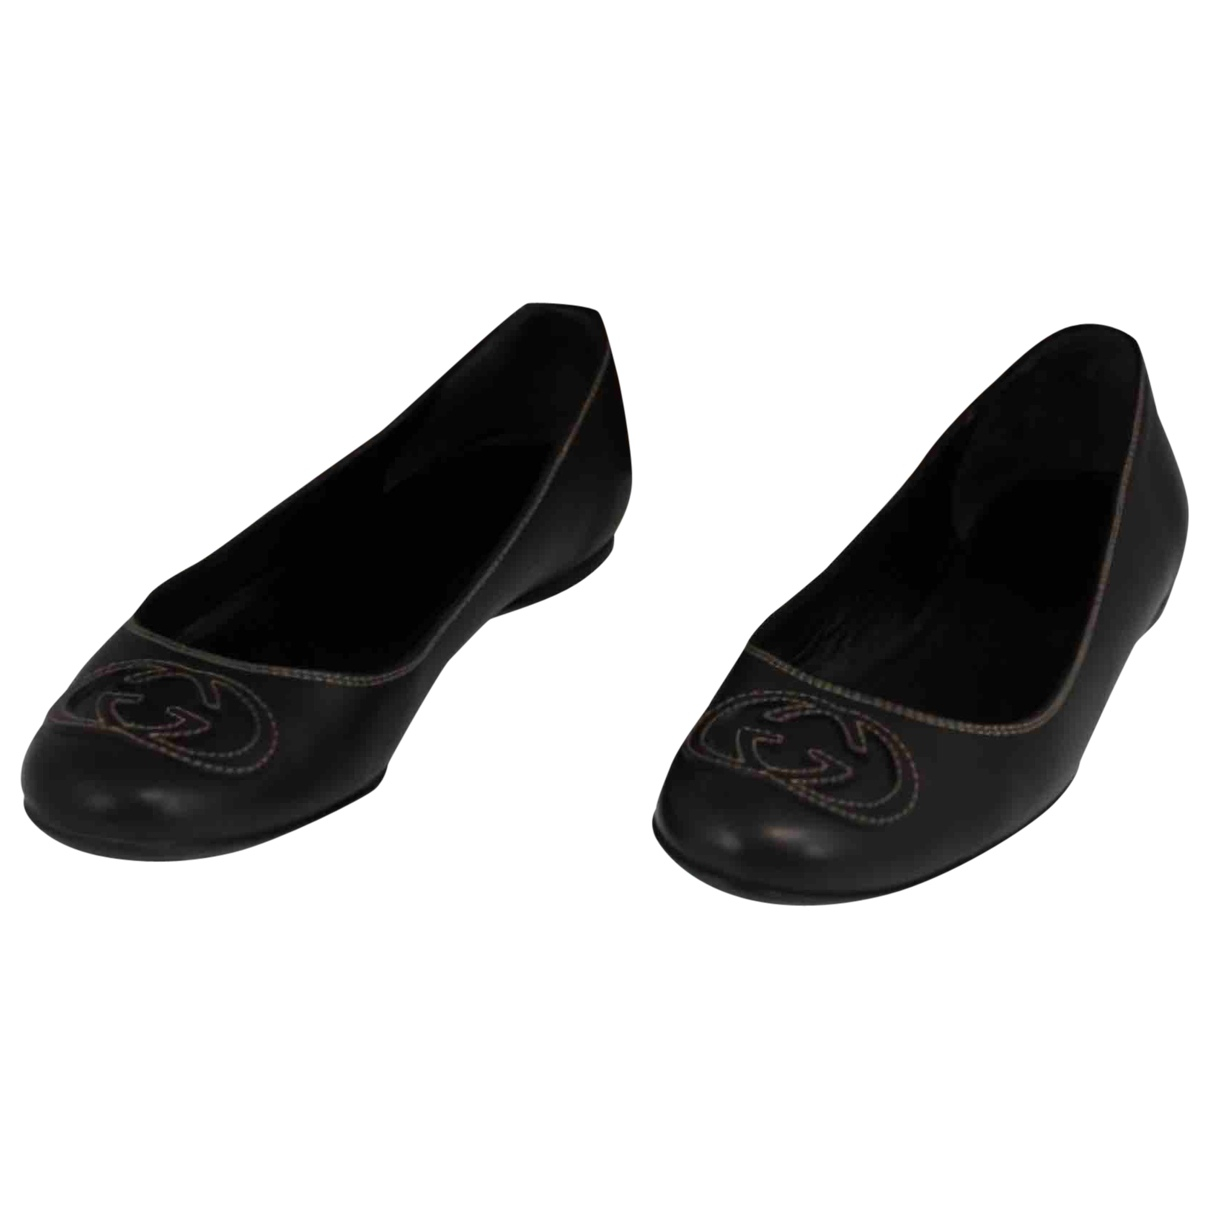 Gucci \N Navy Leather Ballet flats for Women 36.5 EU